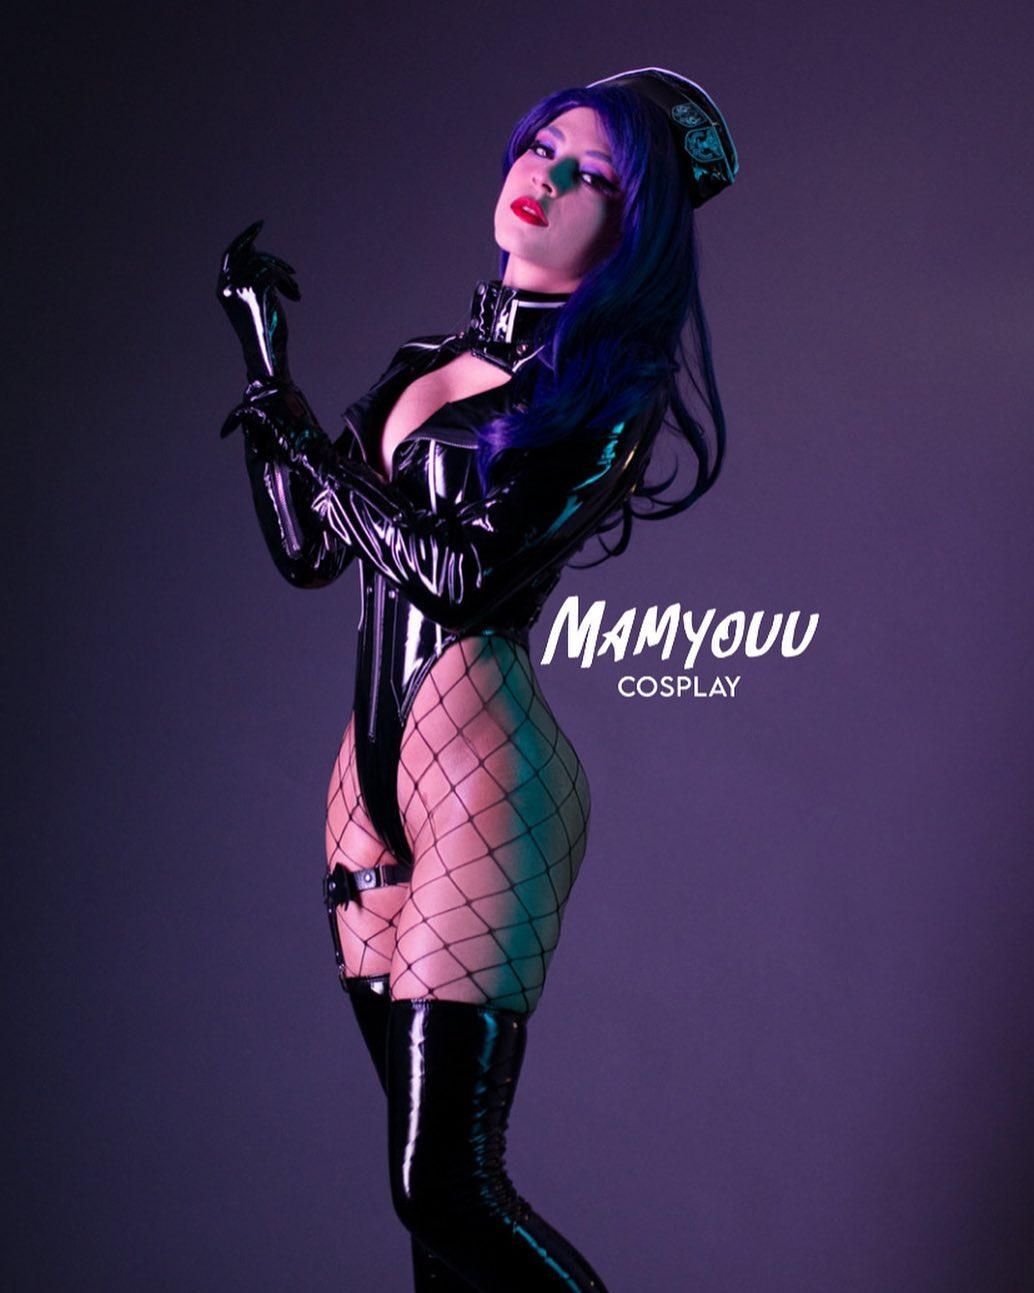 cosplay misato katsuragi mamyou evangelion